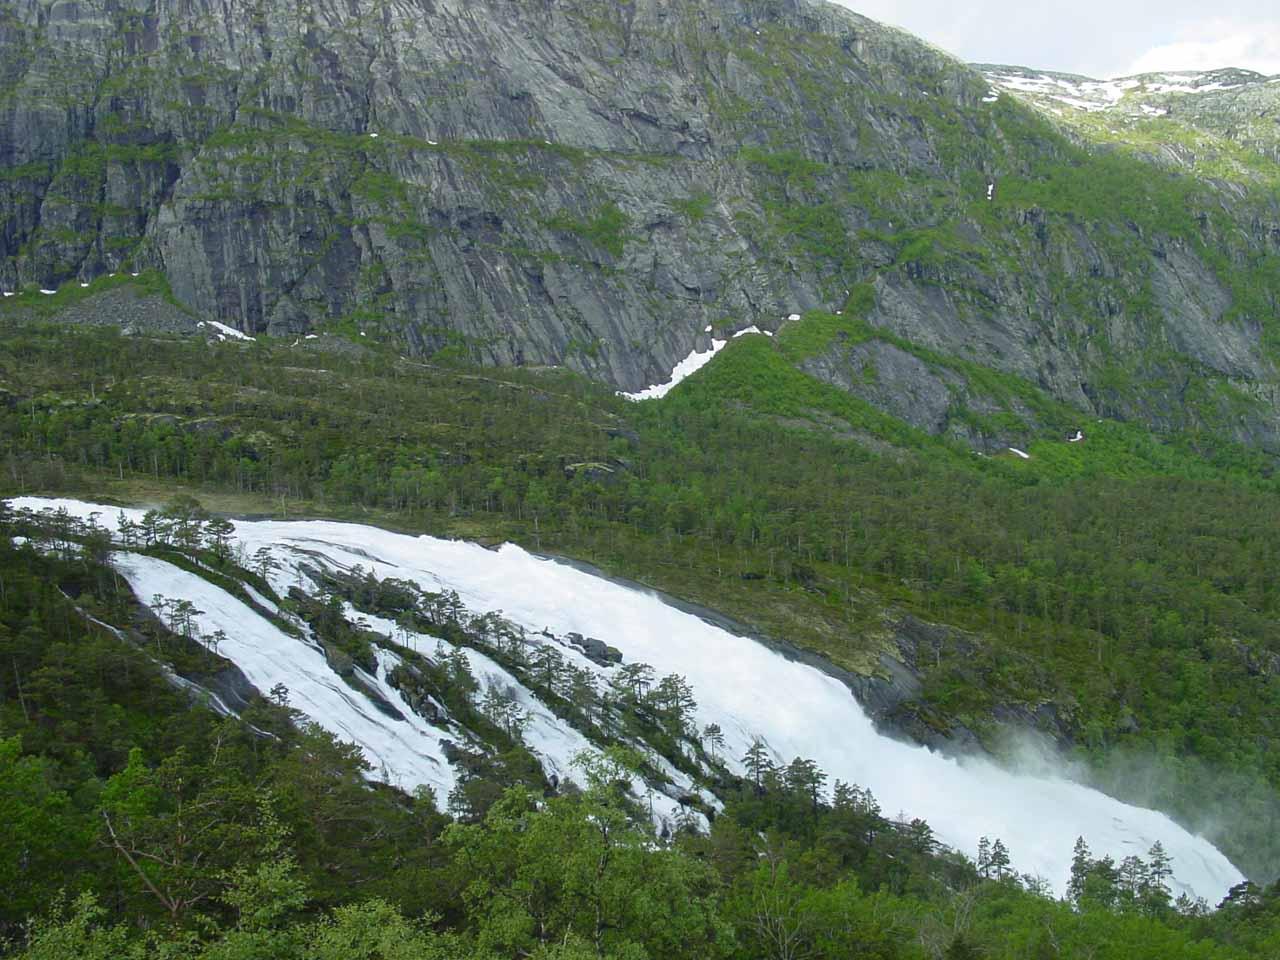 Looking across Nyastølsfossen from the gravel road later that morning on the return hike